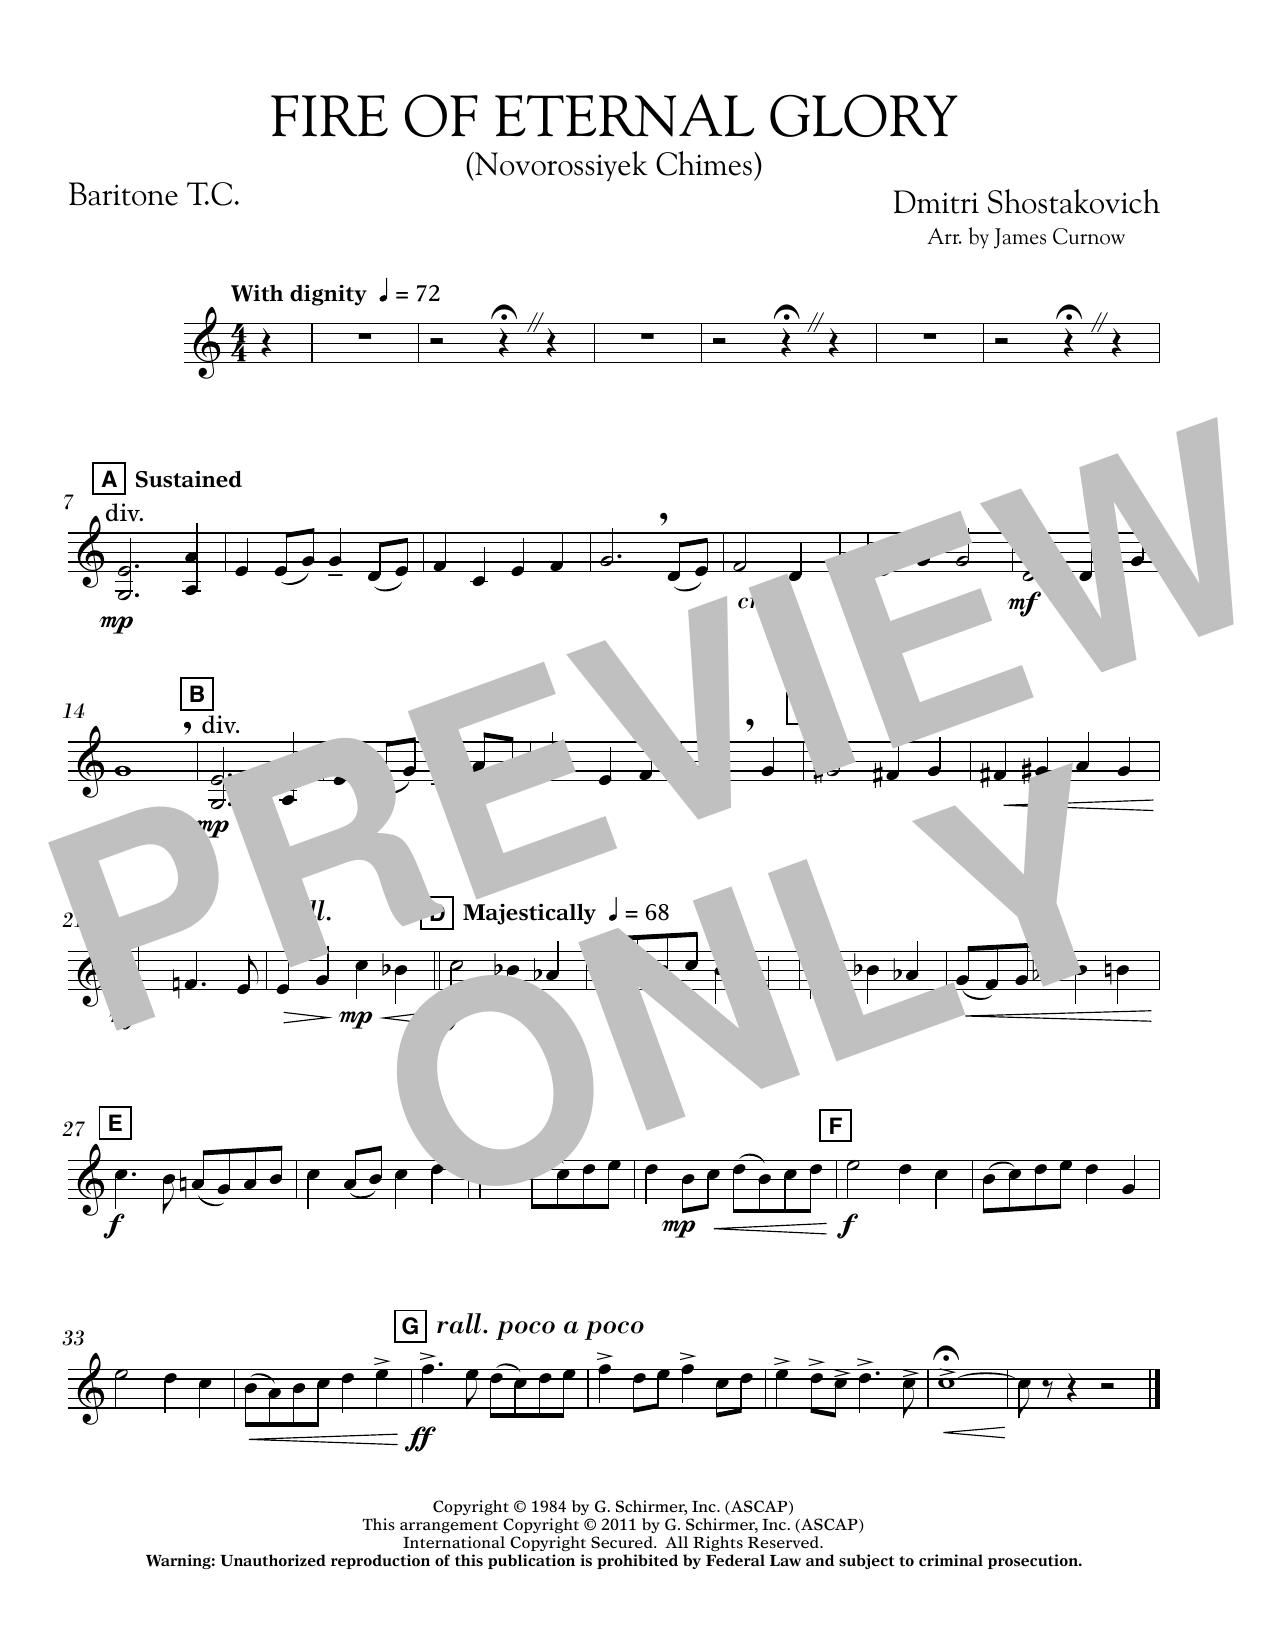 James Curnow Fire of Eternal Glory (Novorossiyek Chimes) - Baritone T.C. sheet music notes printable PDF score